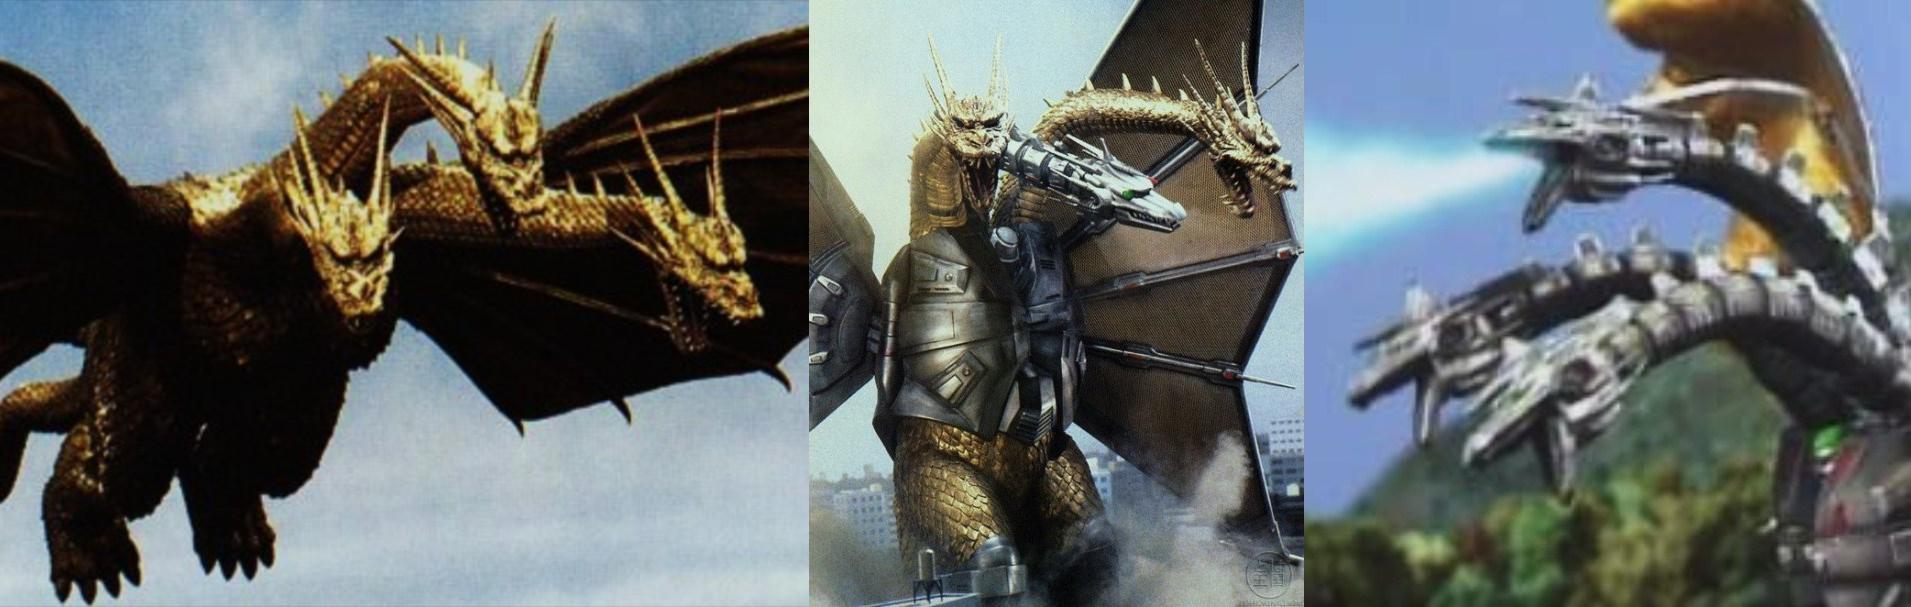 Godzilla Vs Mecha King Ghidorah Image - King Ghidorah-...